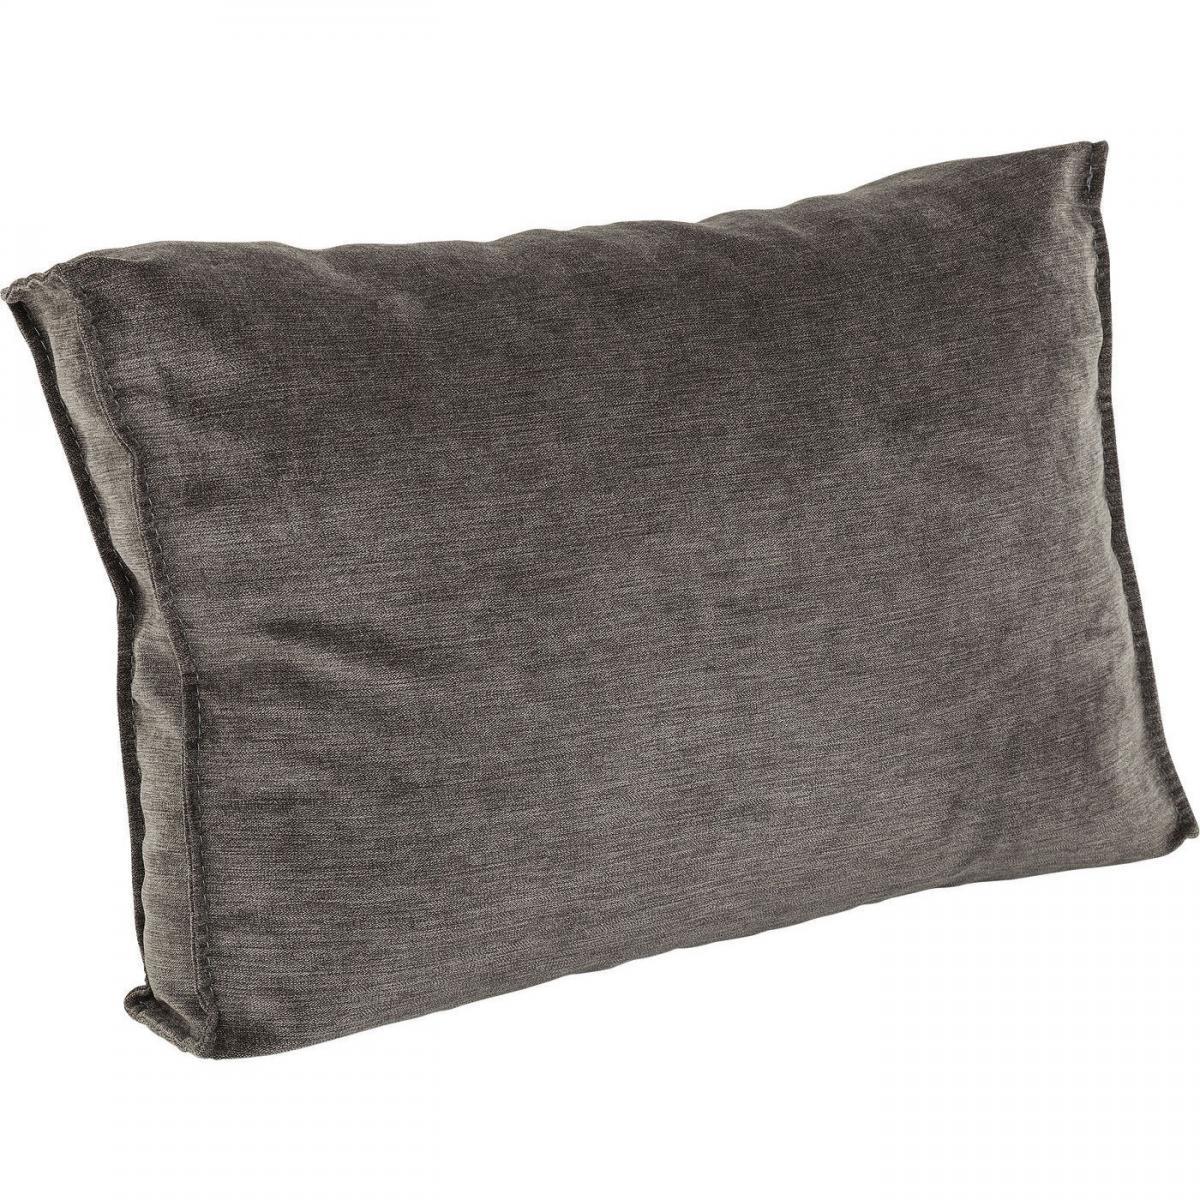 Karedesign Coussin 60x40cm canapé Infinity gris Kare Design